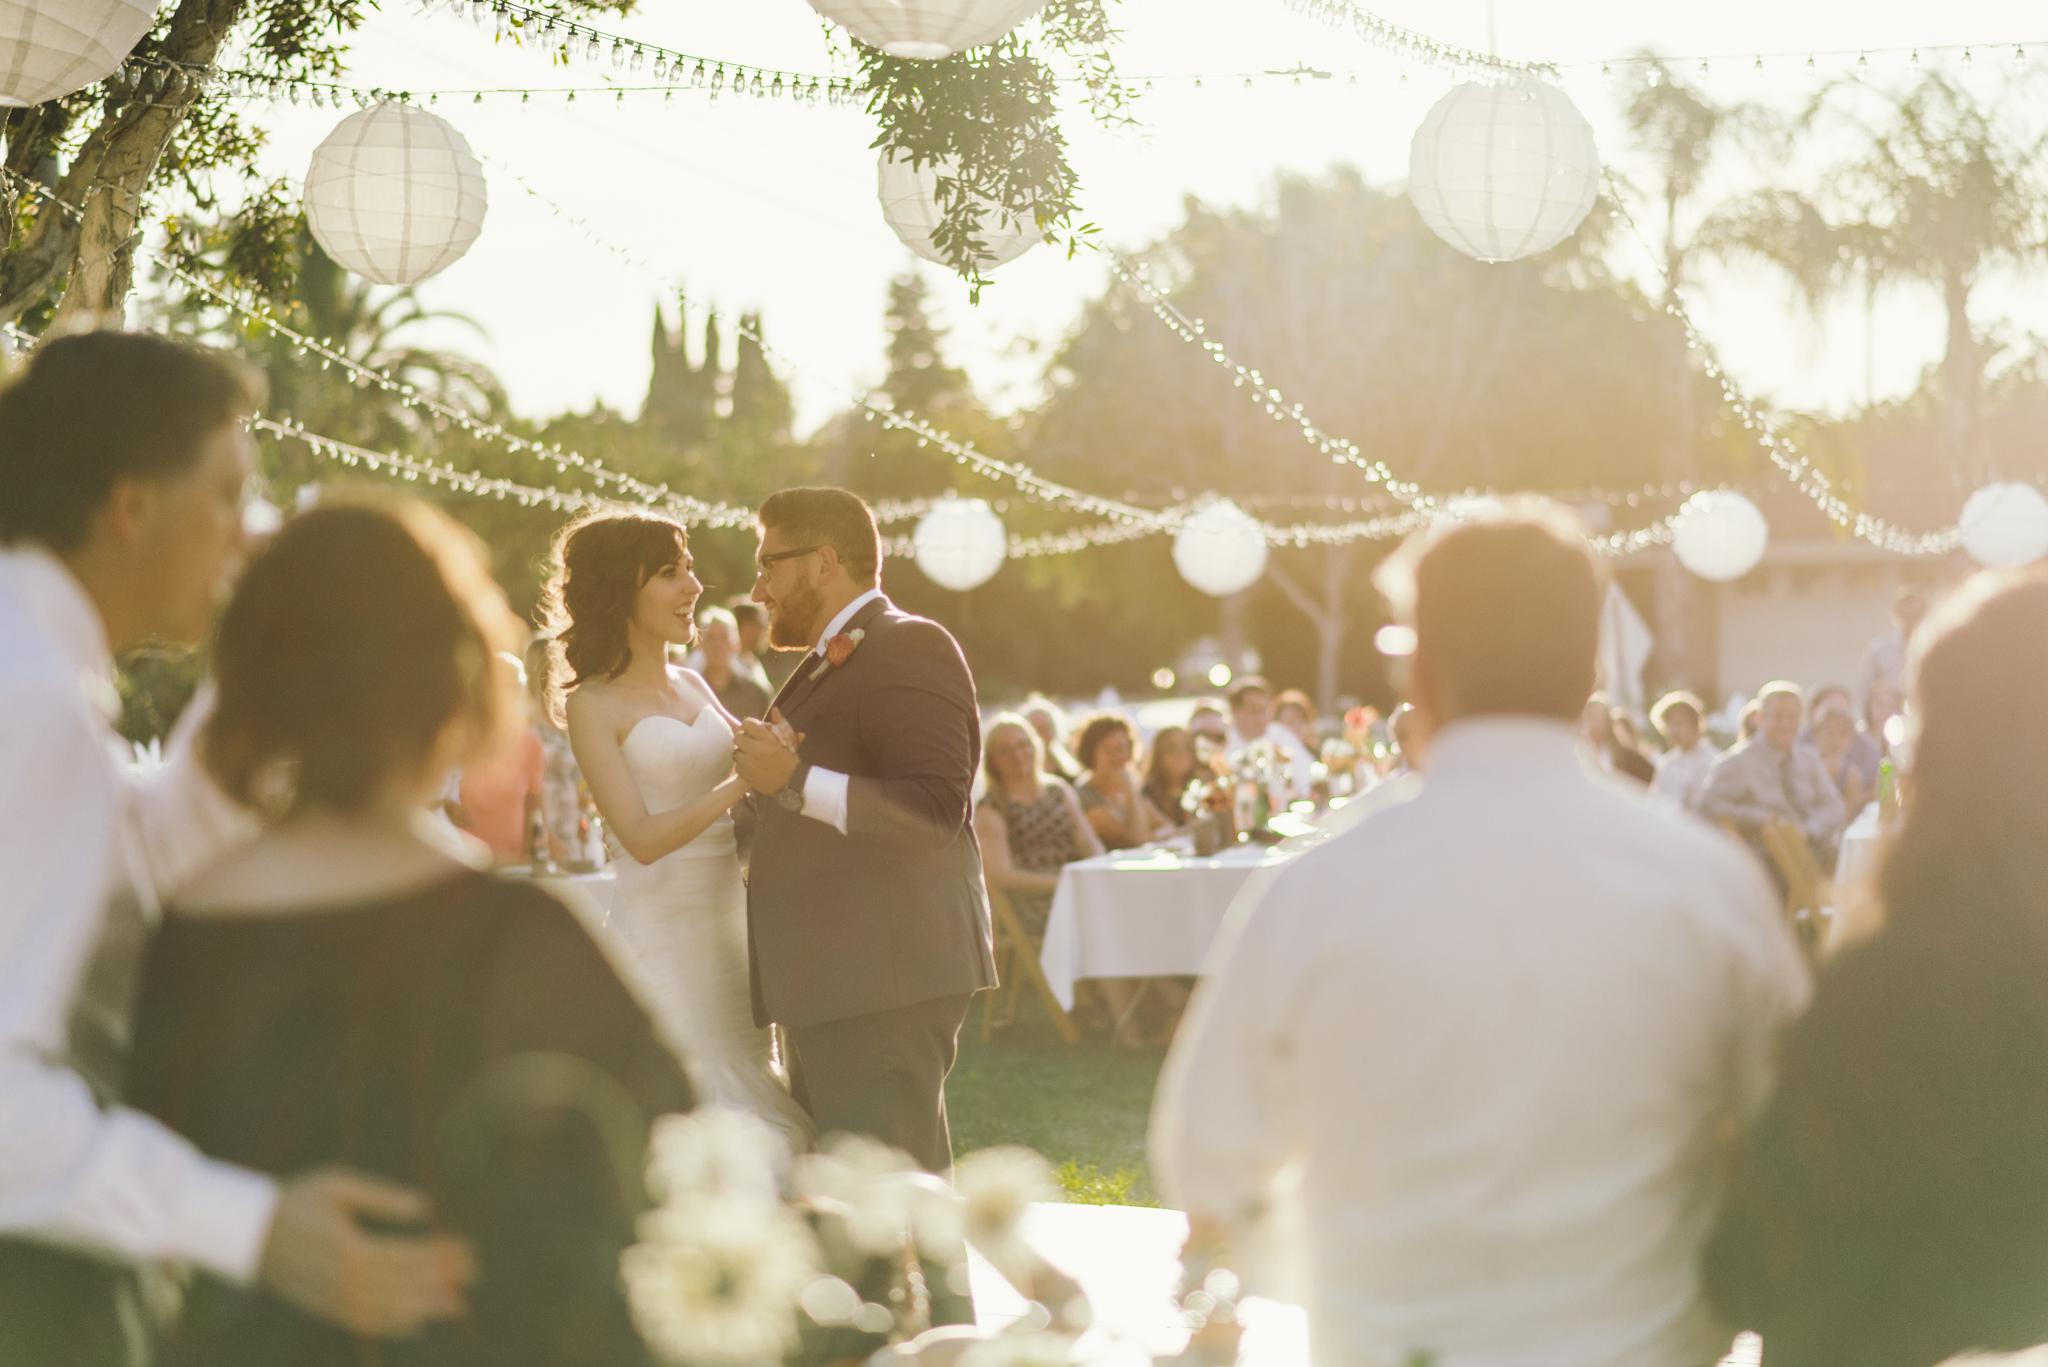 Isaiah & Taylor Photography - Los Angeles Lifestyle Wedding Photographer-46.jpg